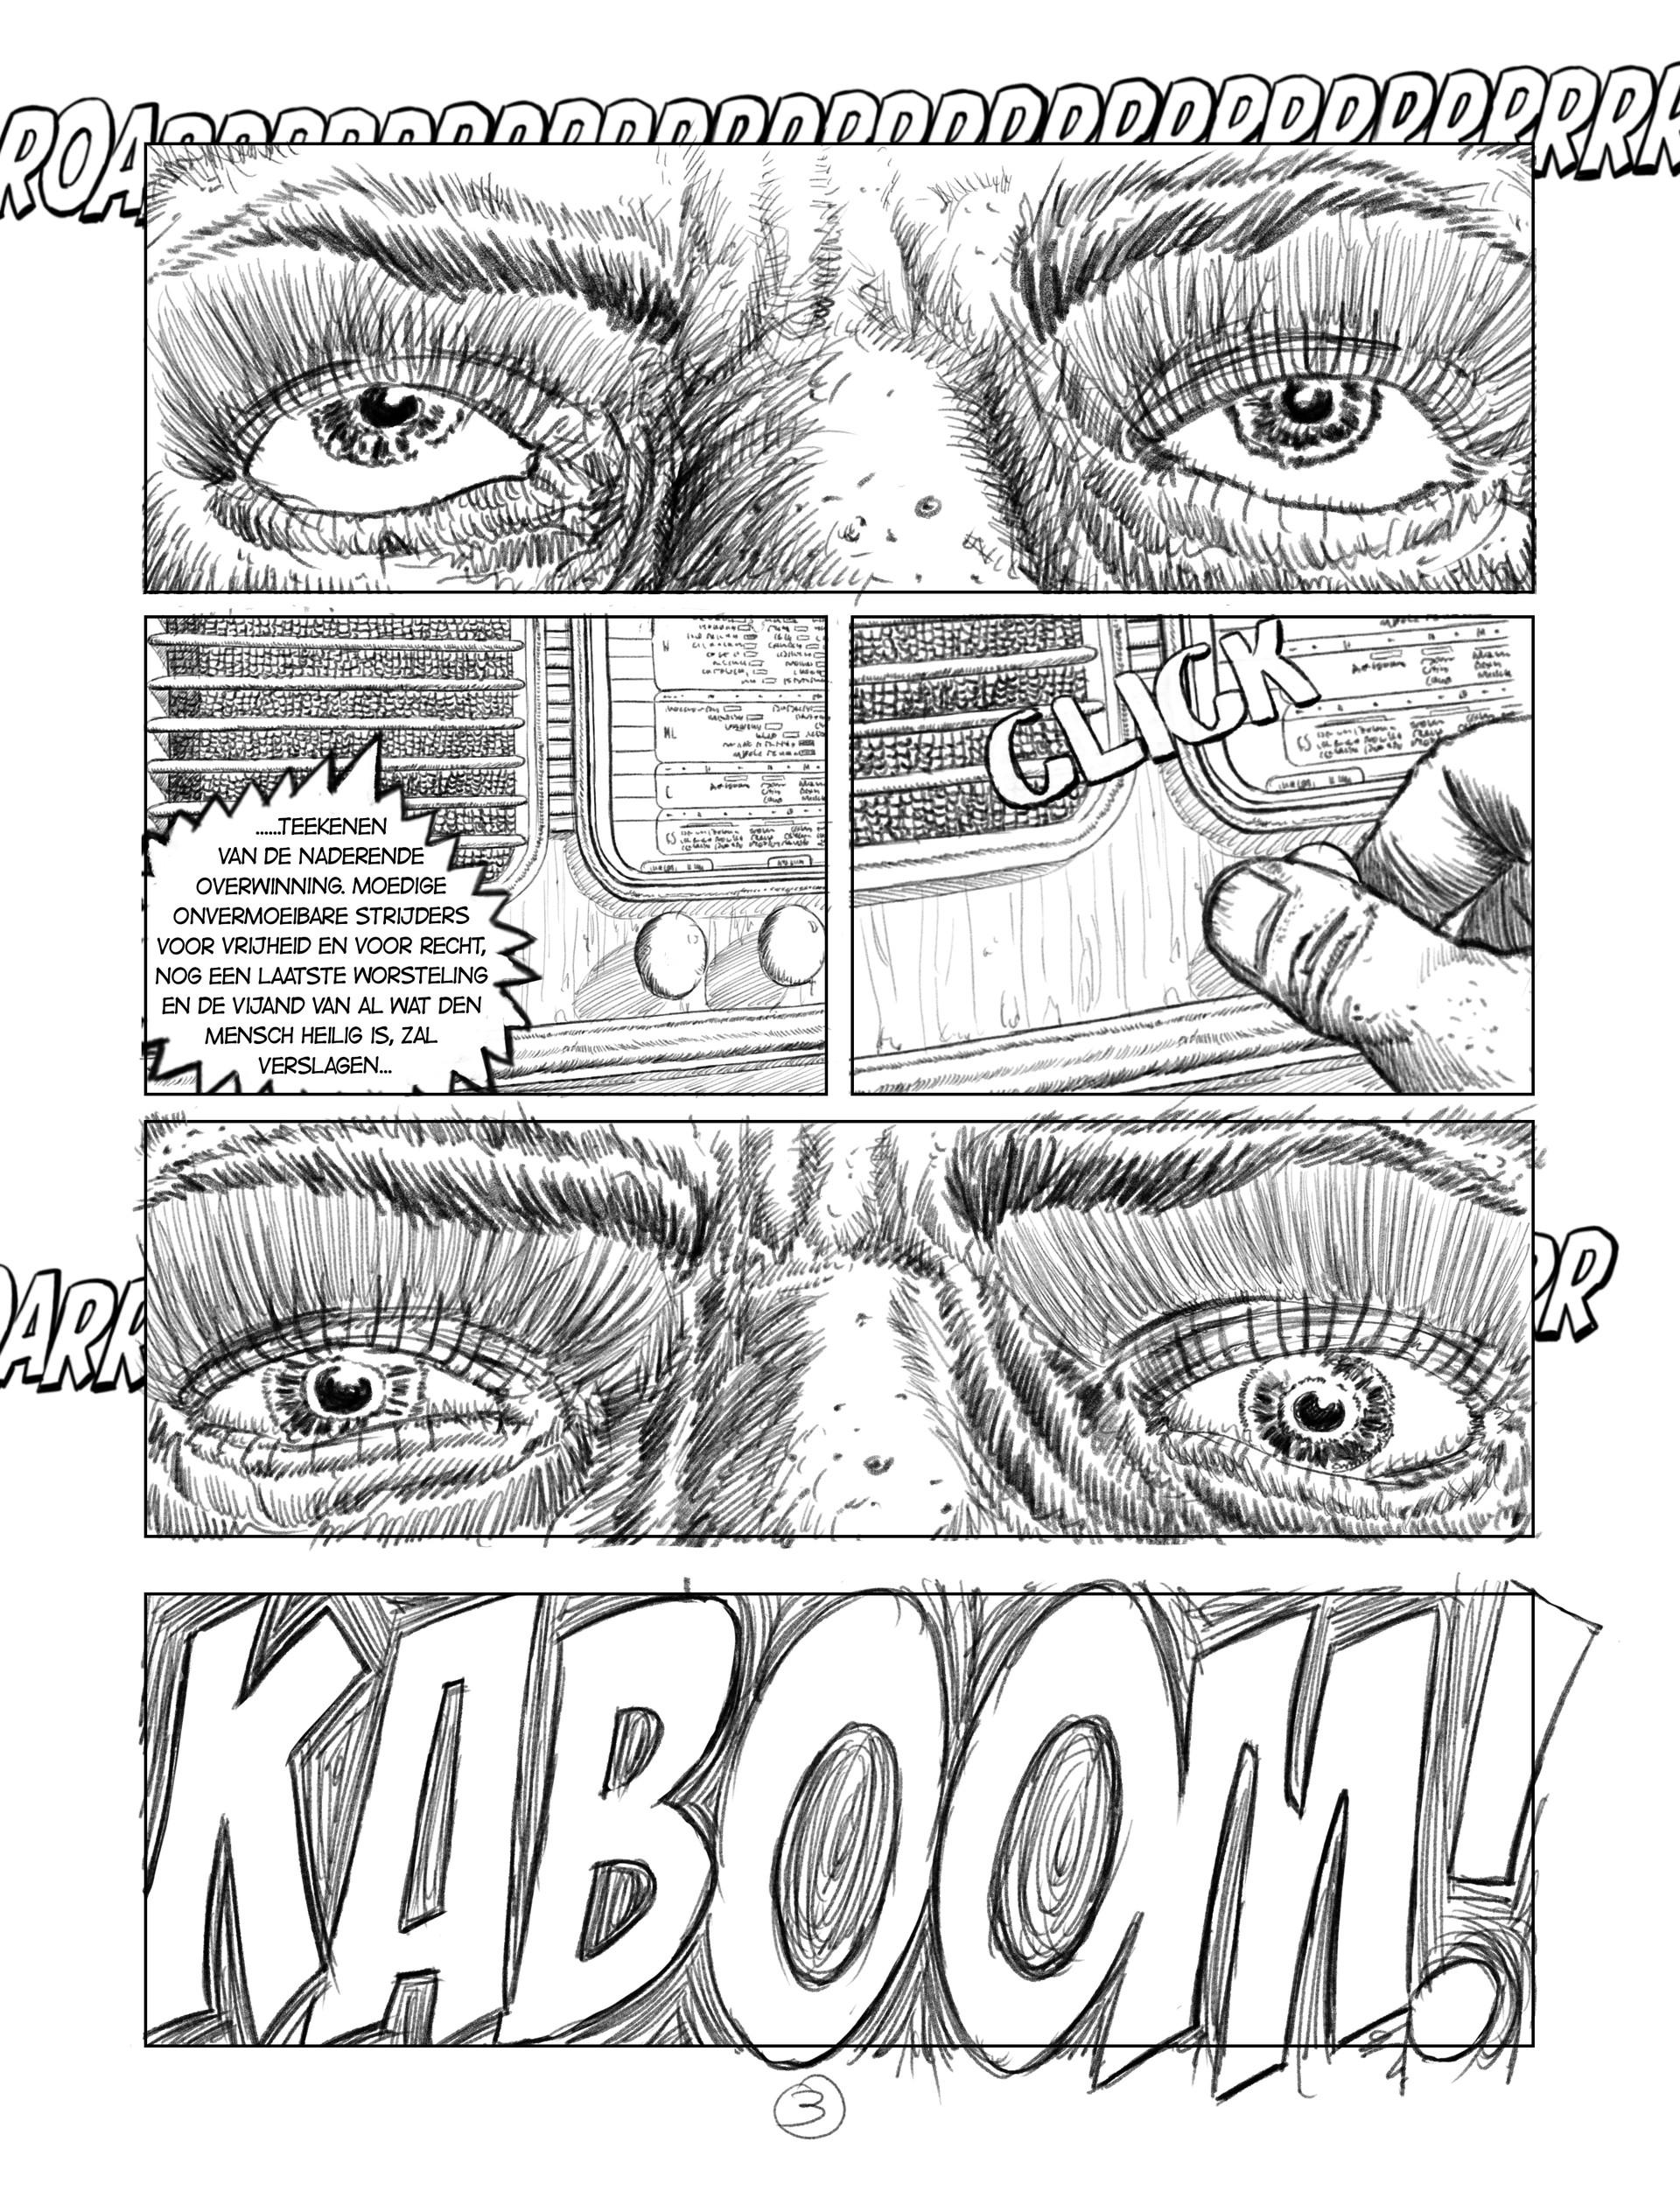 Bobby de groot layout pg3